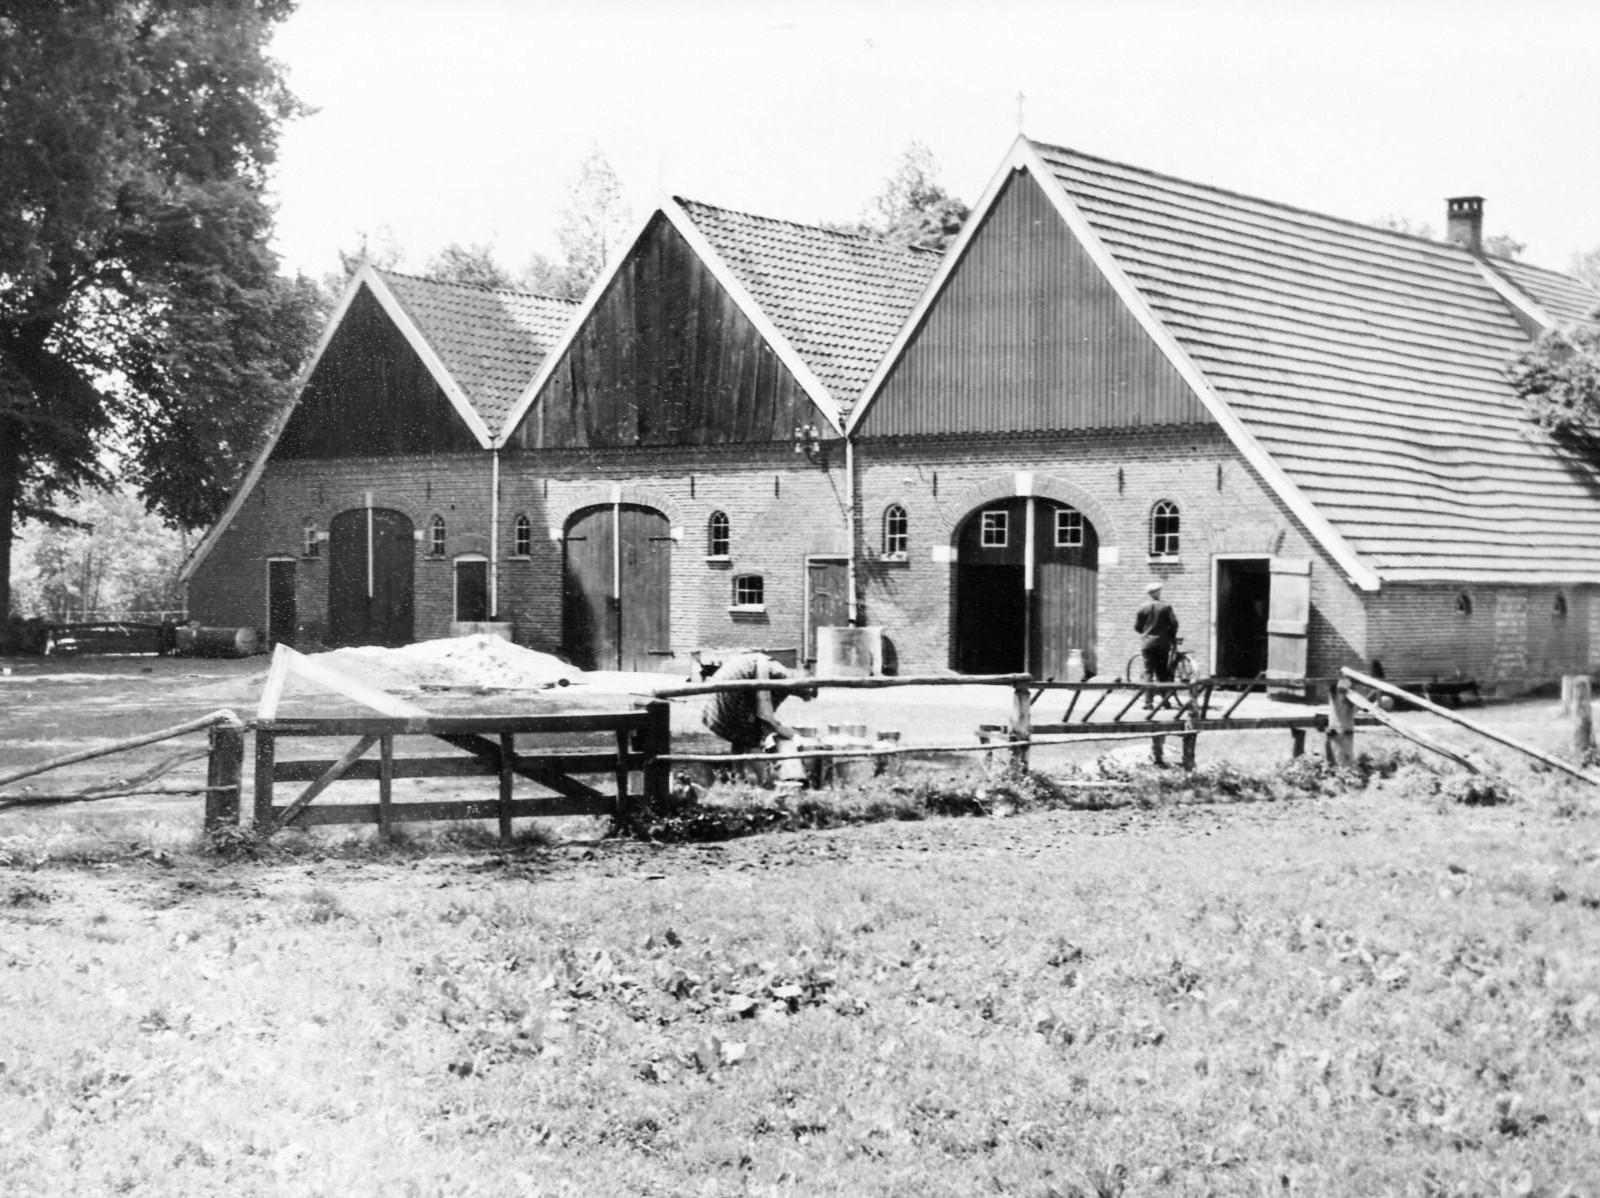 Boerderij met dubbele potstal Tilligte Foto ca. 1950